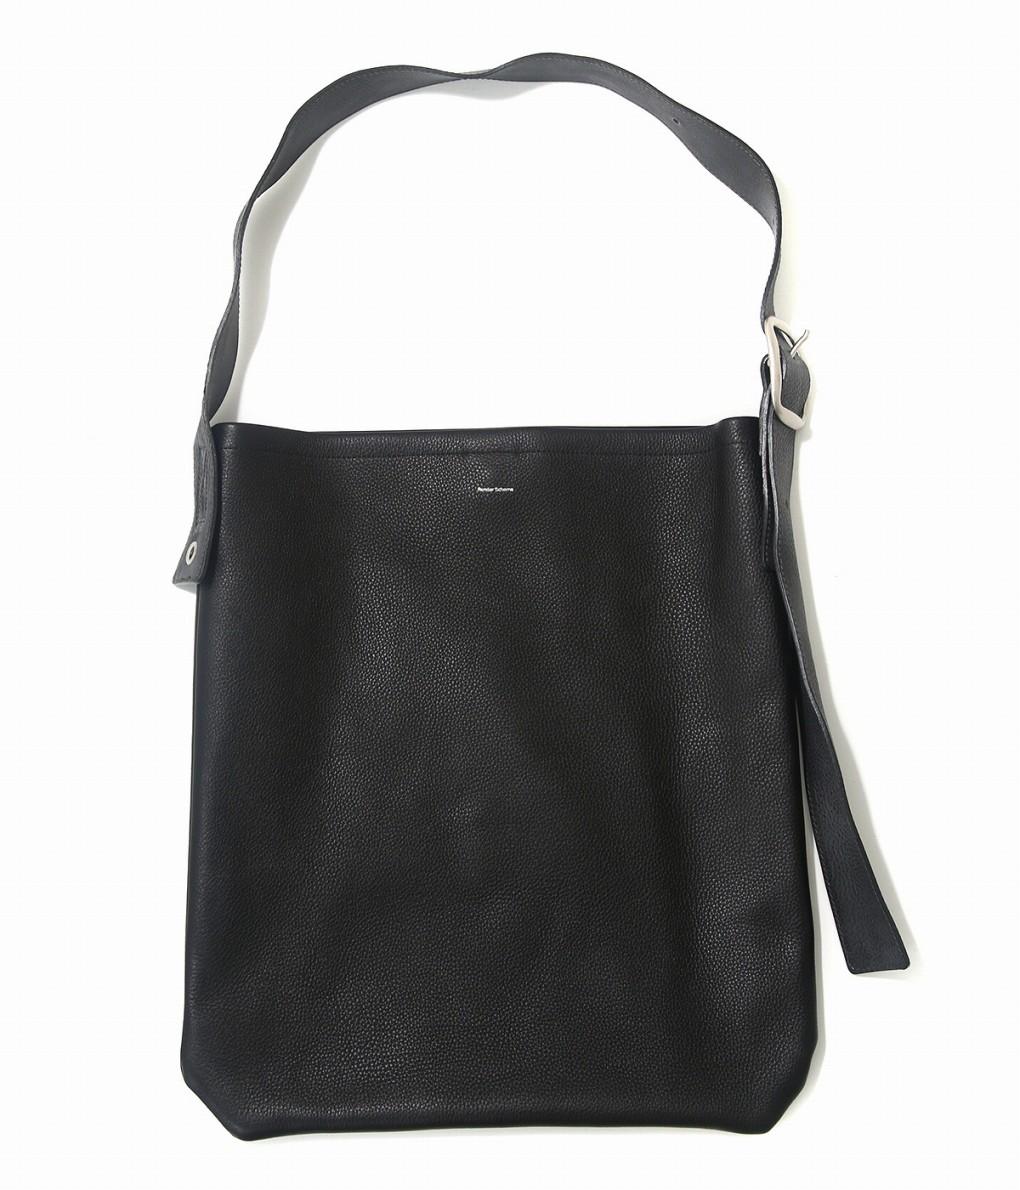 Hender Scheme / エンダースキーマ : one side belt bag / 全2色 : エンダースキーマ ワン サイド ベルト バッグ ショルダー レザーバッグ レディース : nc-rb-osb 【ANN】【BJB】